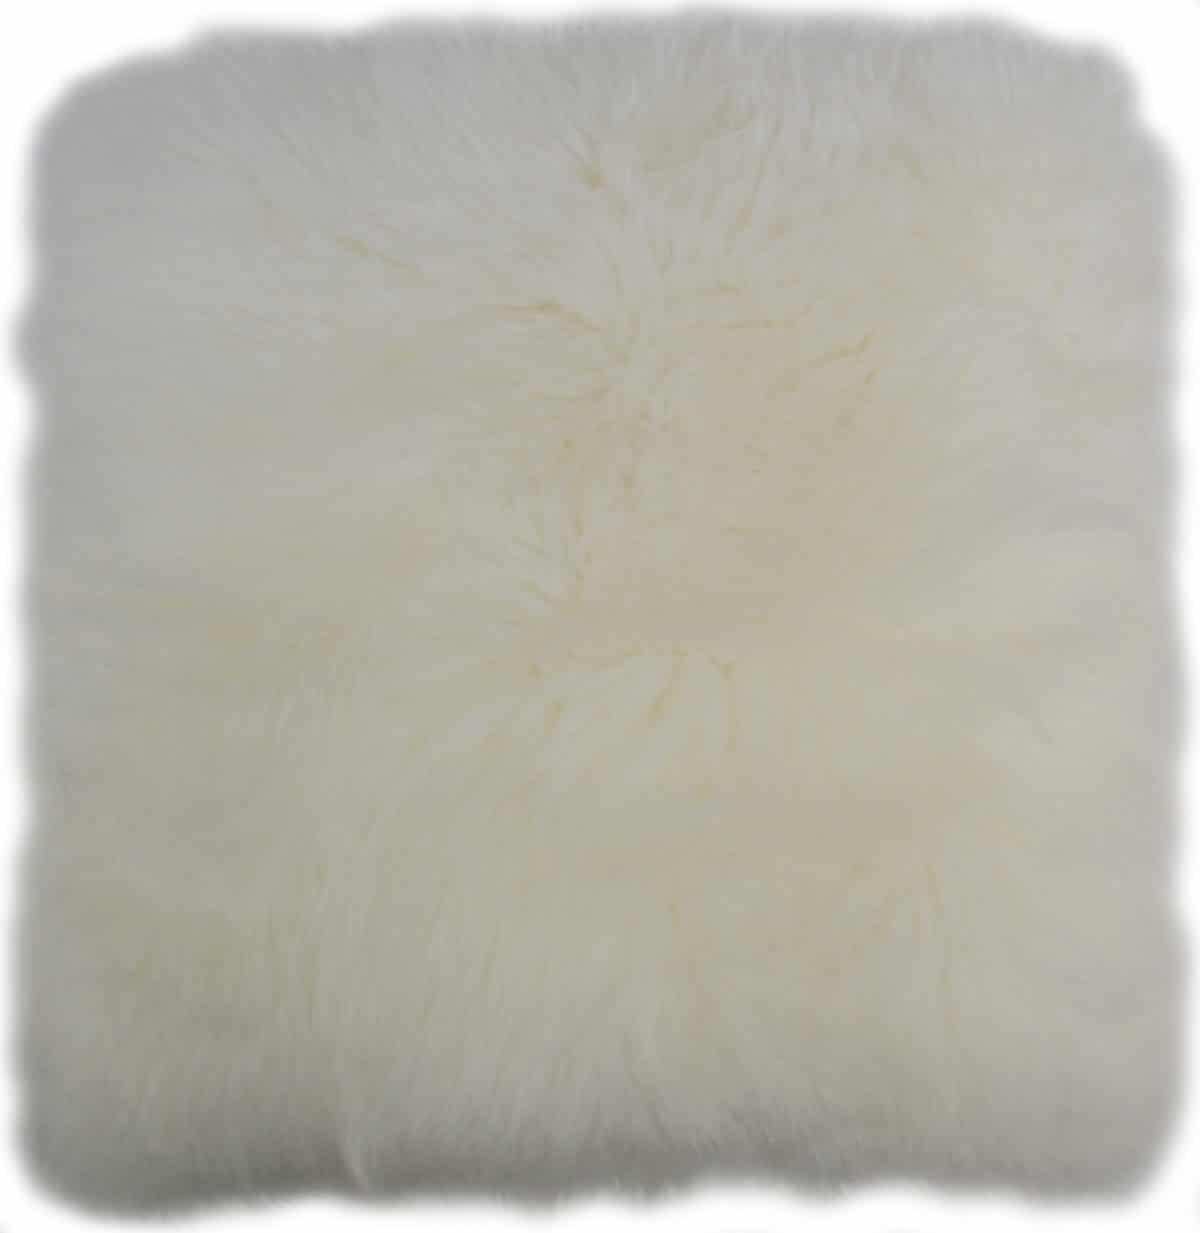 Australian Sheepskin Cushion 40cm x 40xm - White